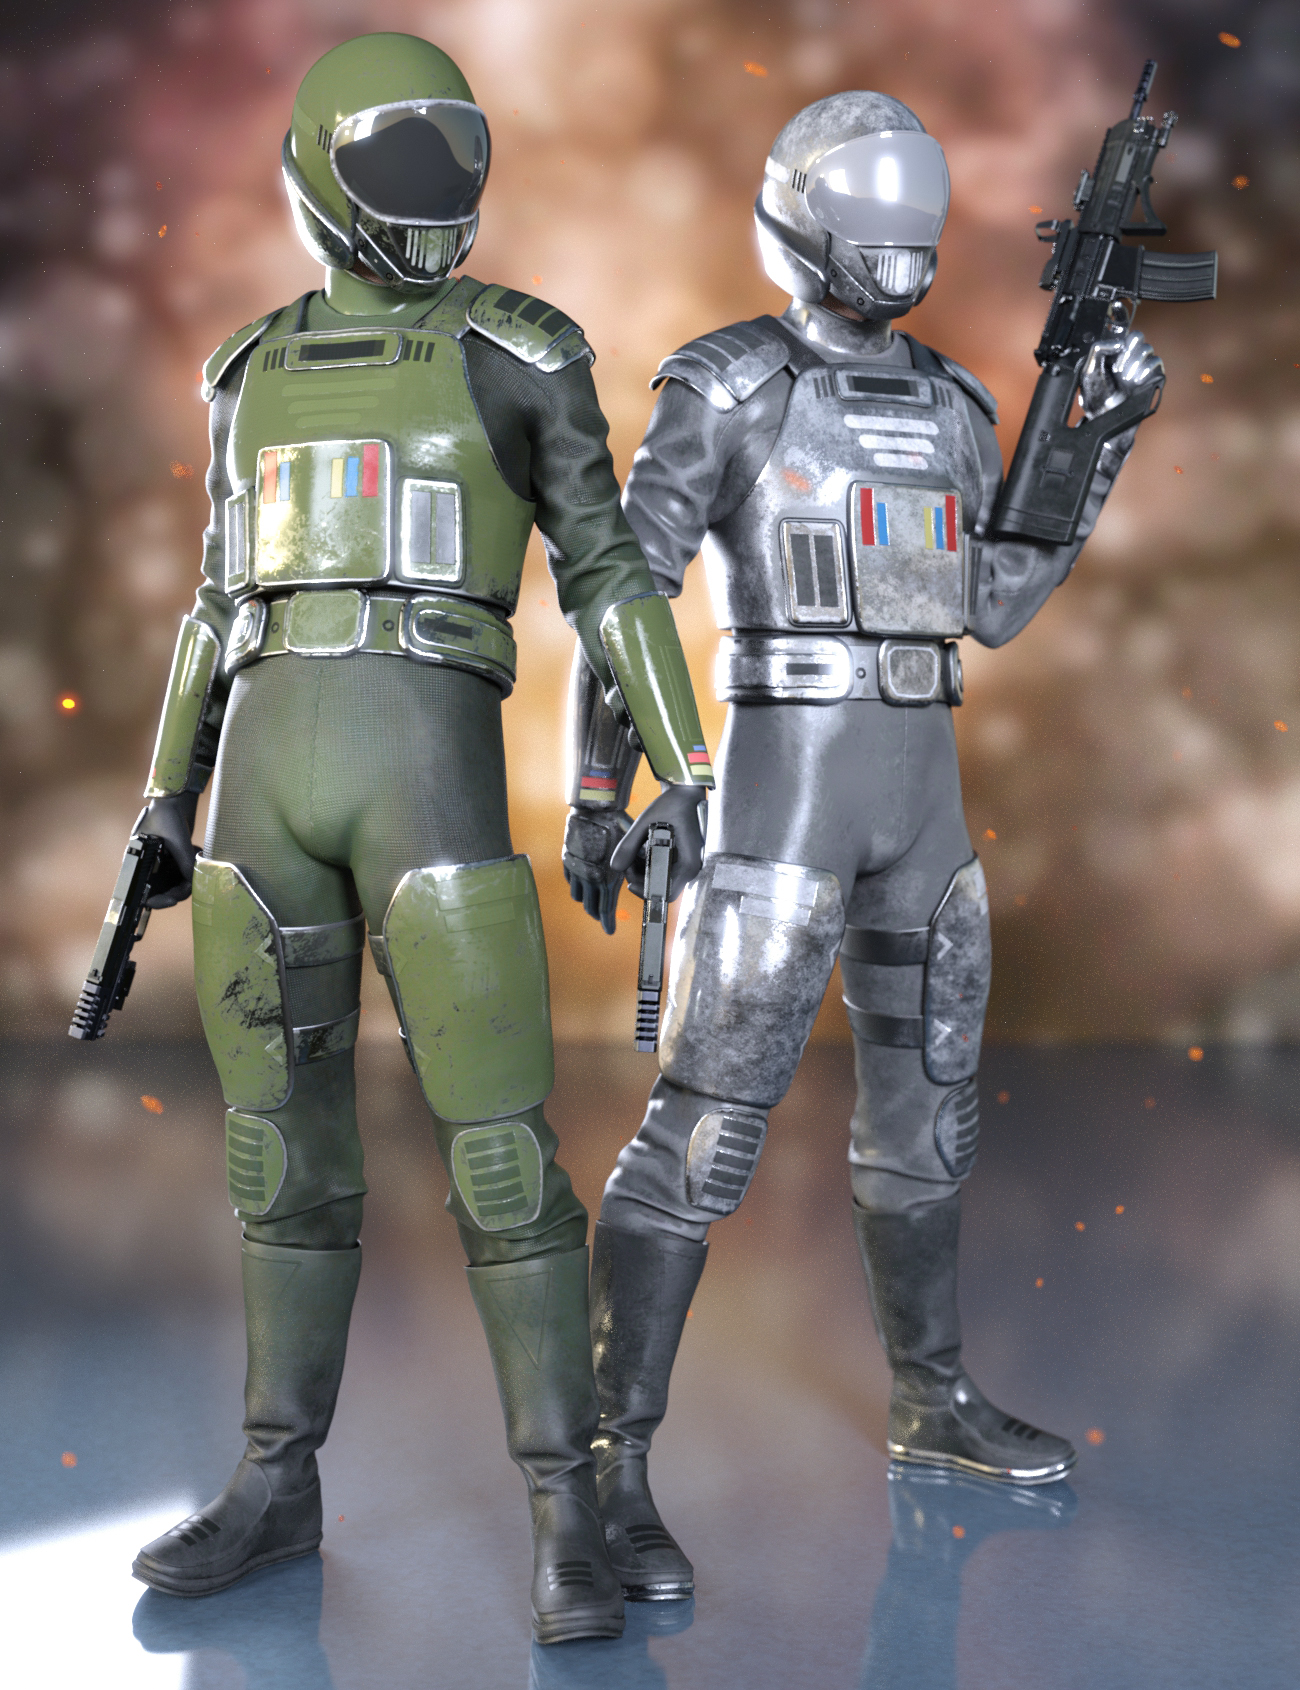 Sci-Fi Starship Pilot Texture Addon by: Yura, 3D Models by Daz 3D